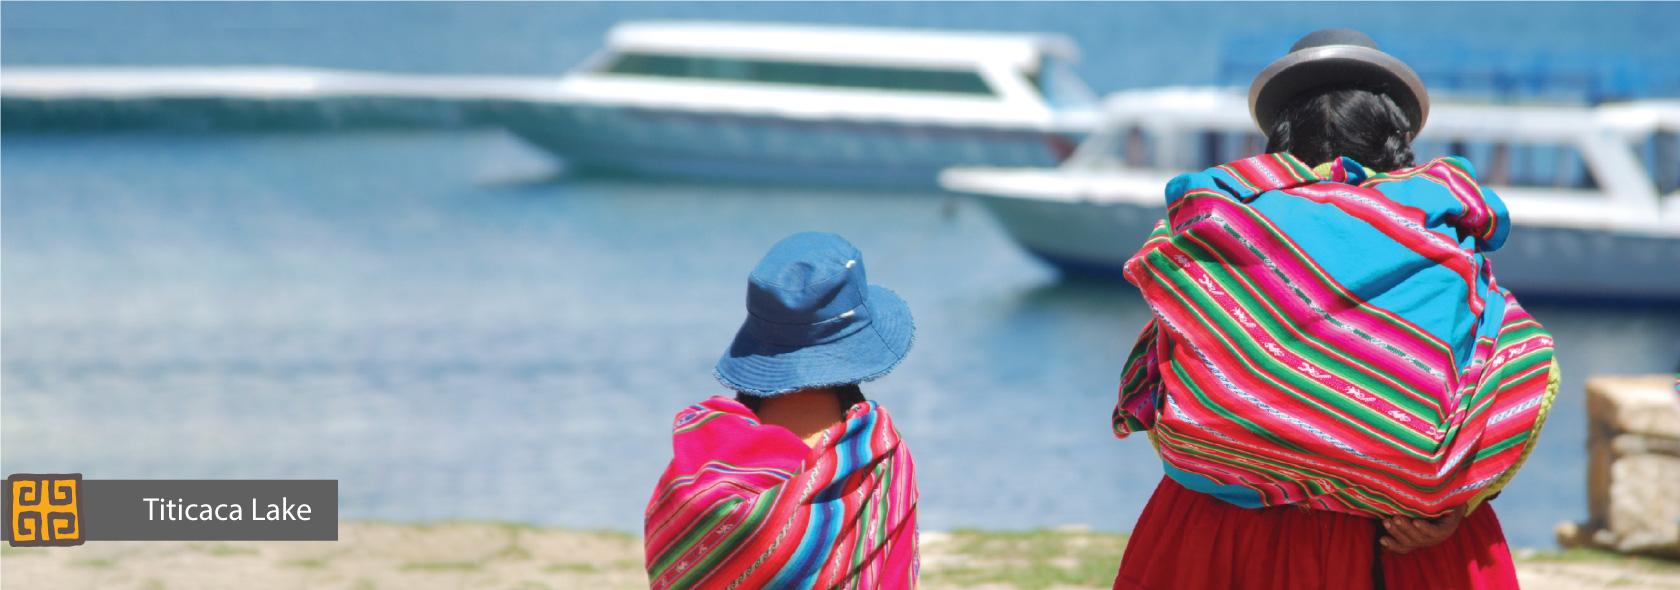 Titicaca-Lakes